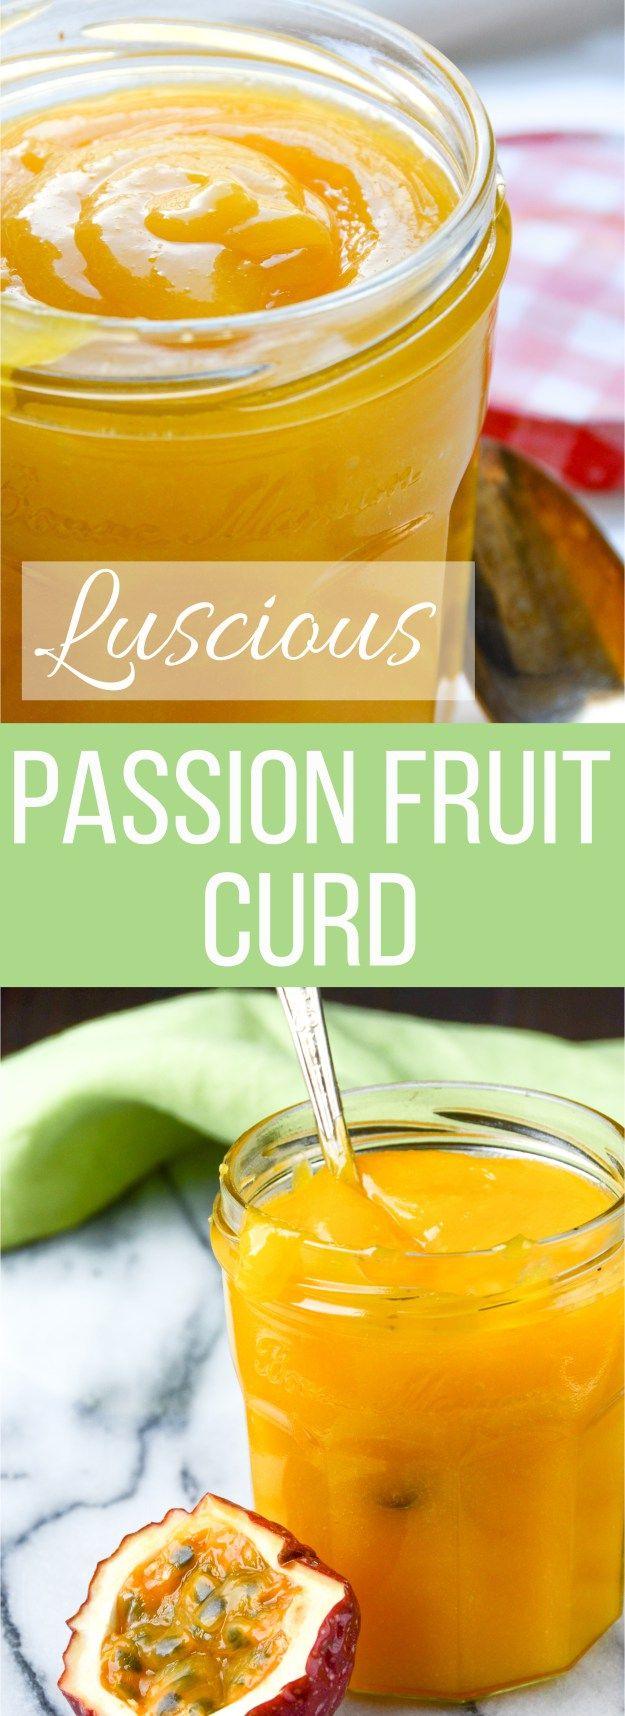 Garlic + Zest - Sweet Tart Passion Fruit Curd recipe